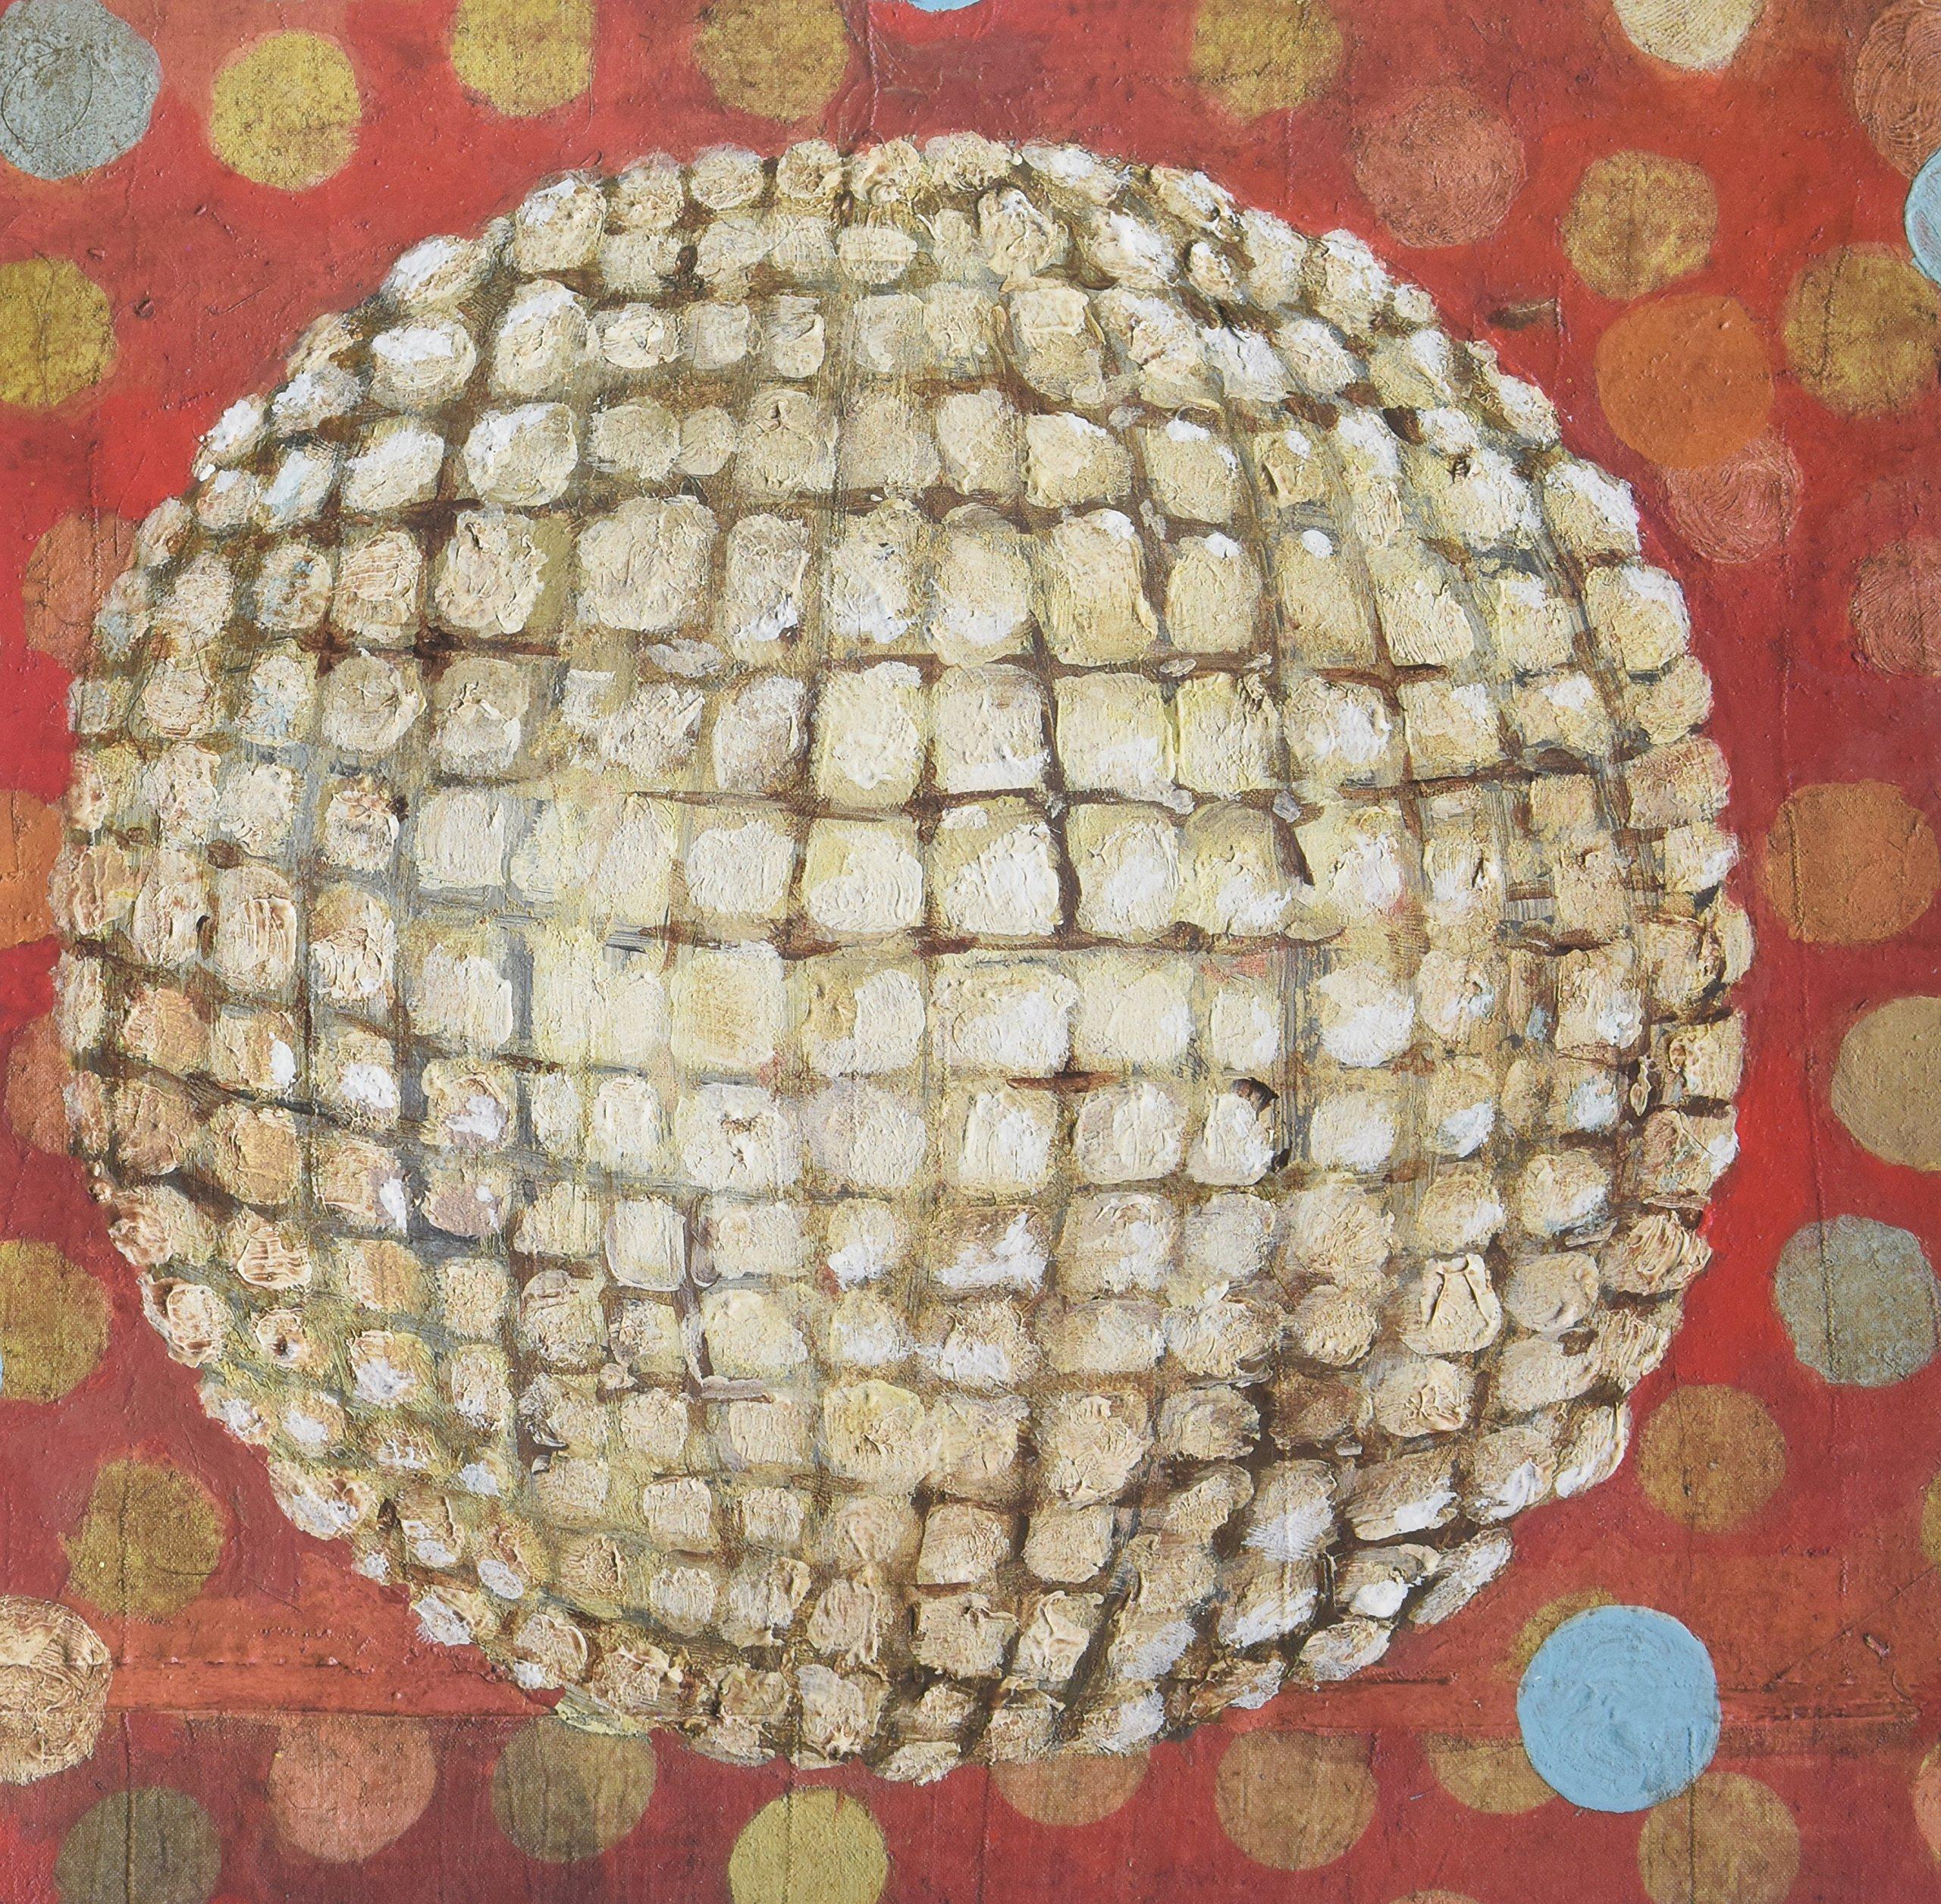 Vinilo : Jim Orourke - Bad Timing (LP Vinyl)